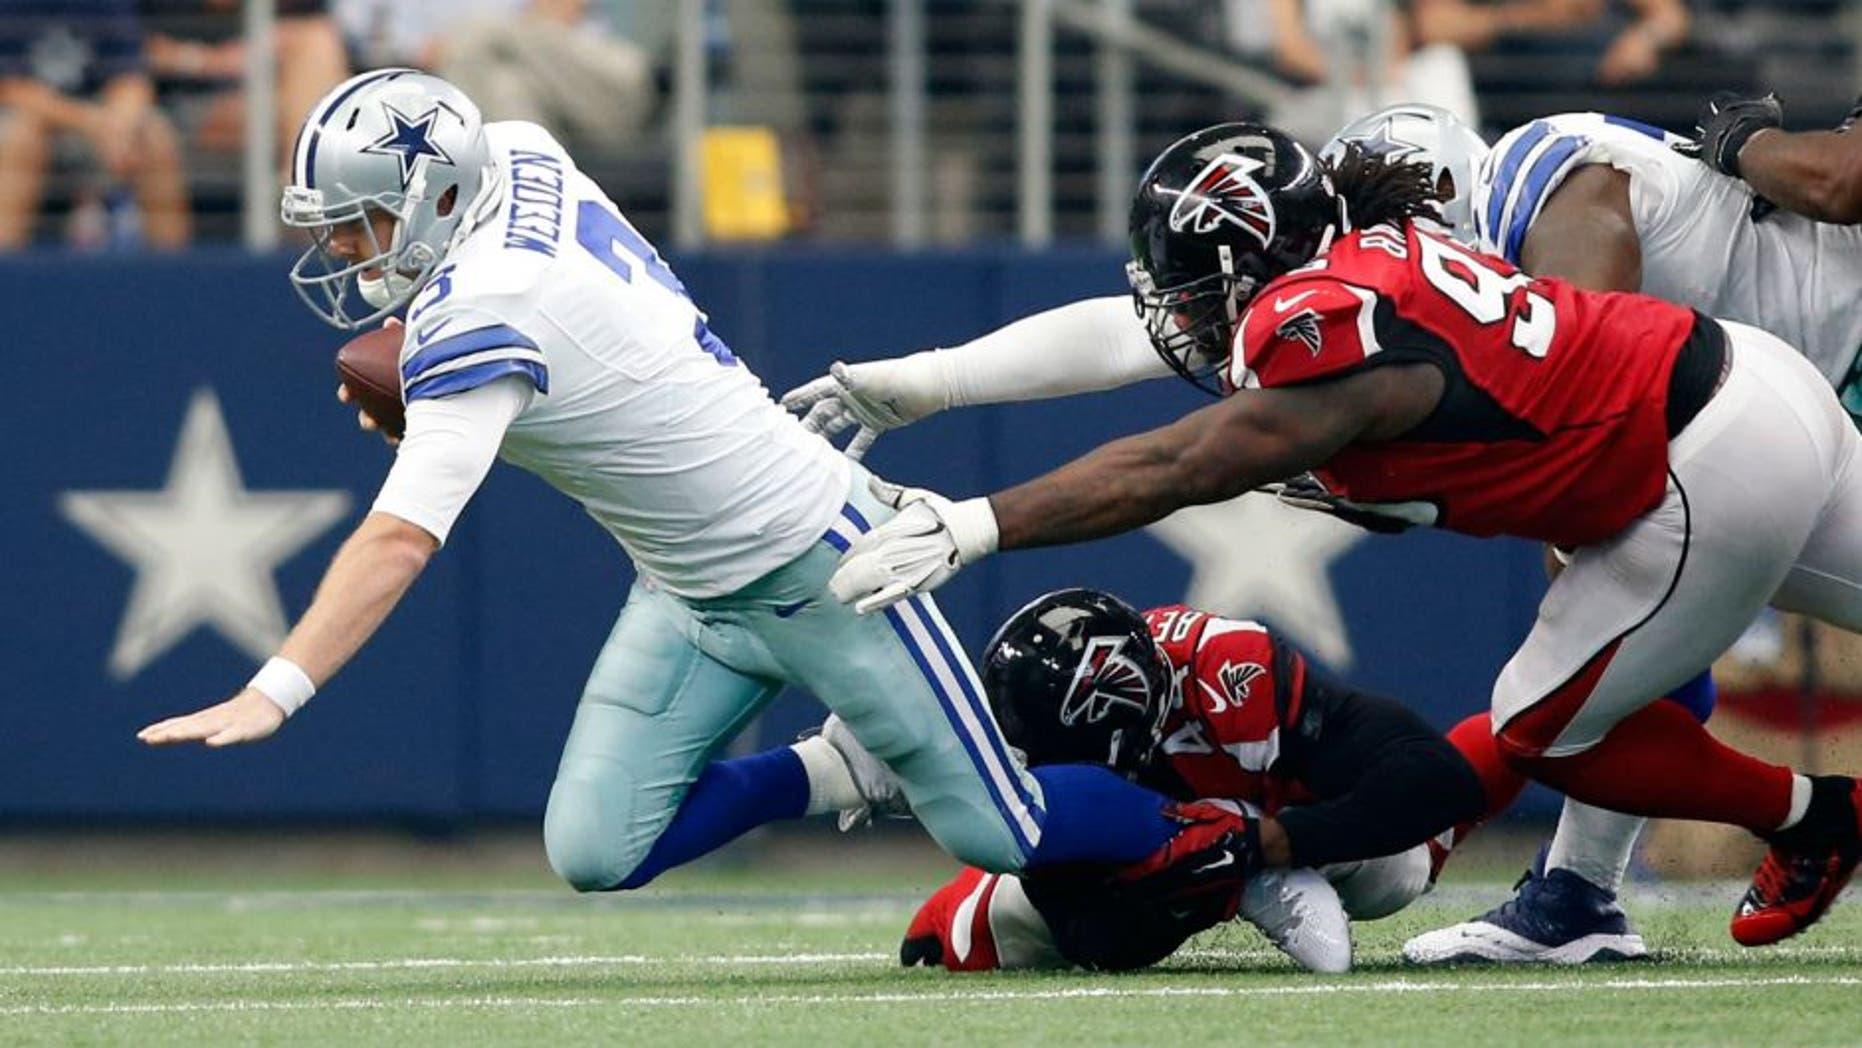 Sep 27, 2015; Arlington, TX, USA; Dallas Cowboys quarterback Brandon Weeden (3) is sacked by Atlanta Falcons linebacker Vic Beasley (44) and defensive tackle Jonathan Babineaux (95) in the fourth quarter in at AT&T Stadium. Atlanta won 39-28. Mandatory Credit: Tim Heitman-USA TODAY Sports